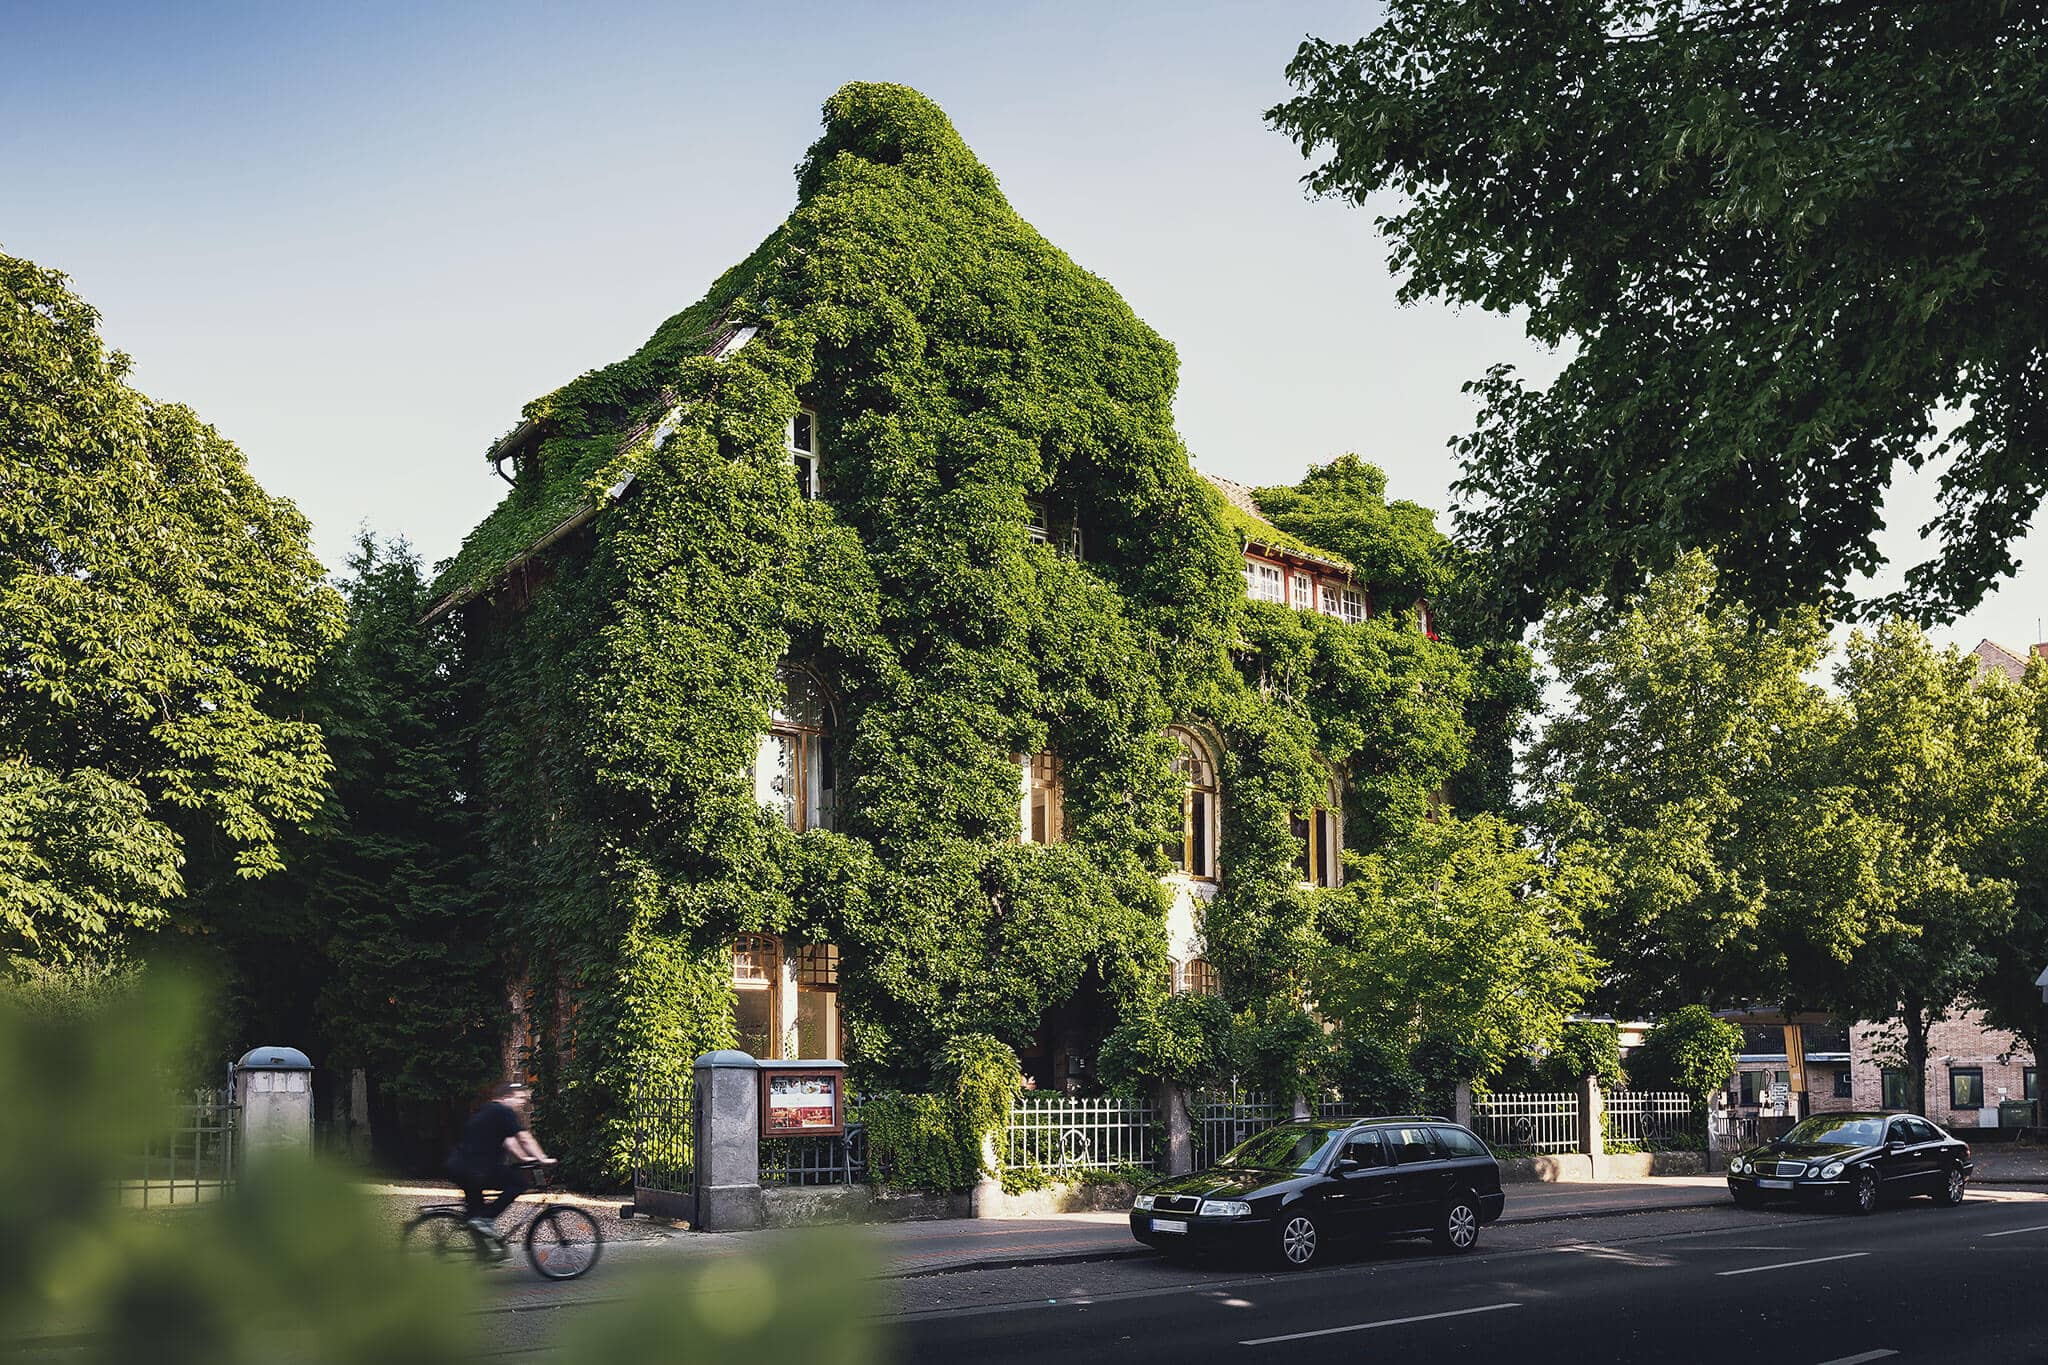 Roneburg, Königsworther Straße - Grüne Stadt Hannover